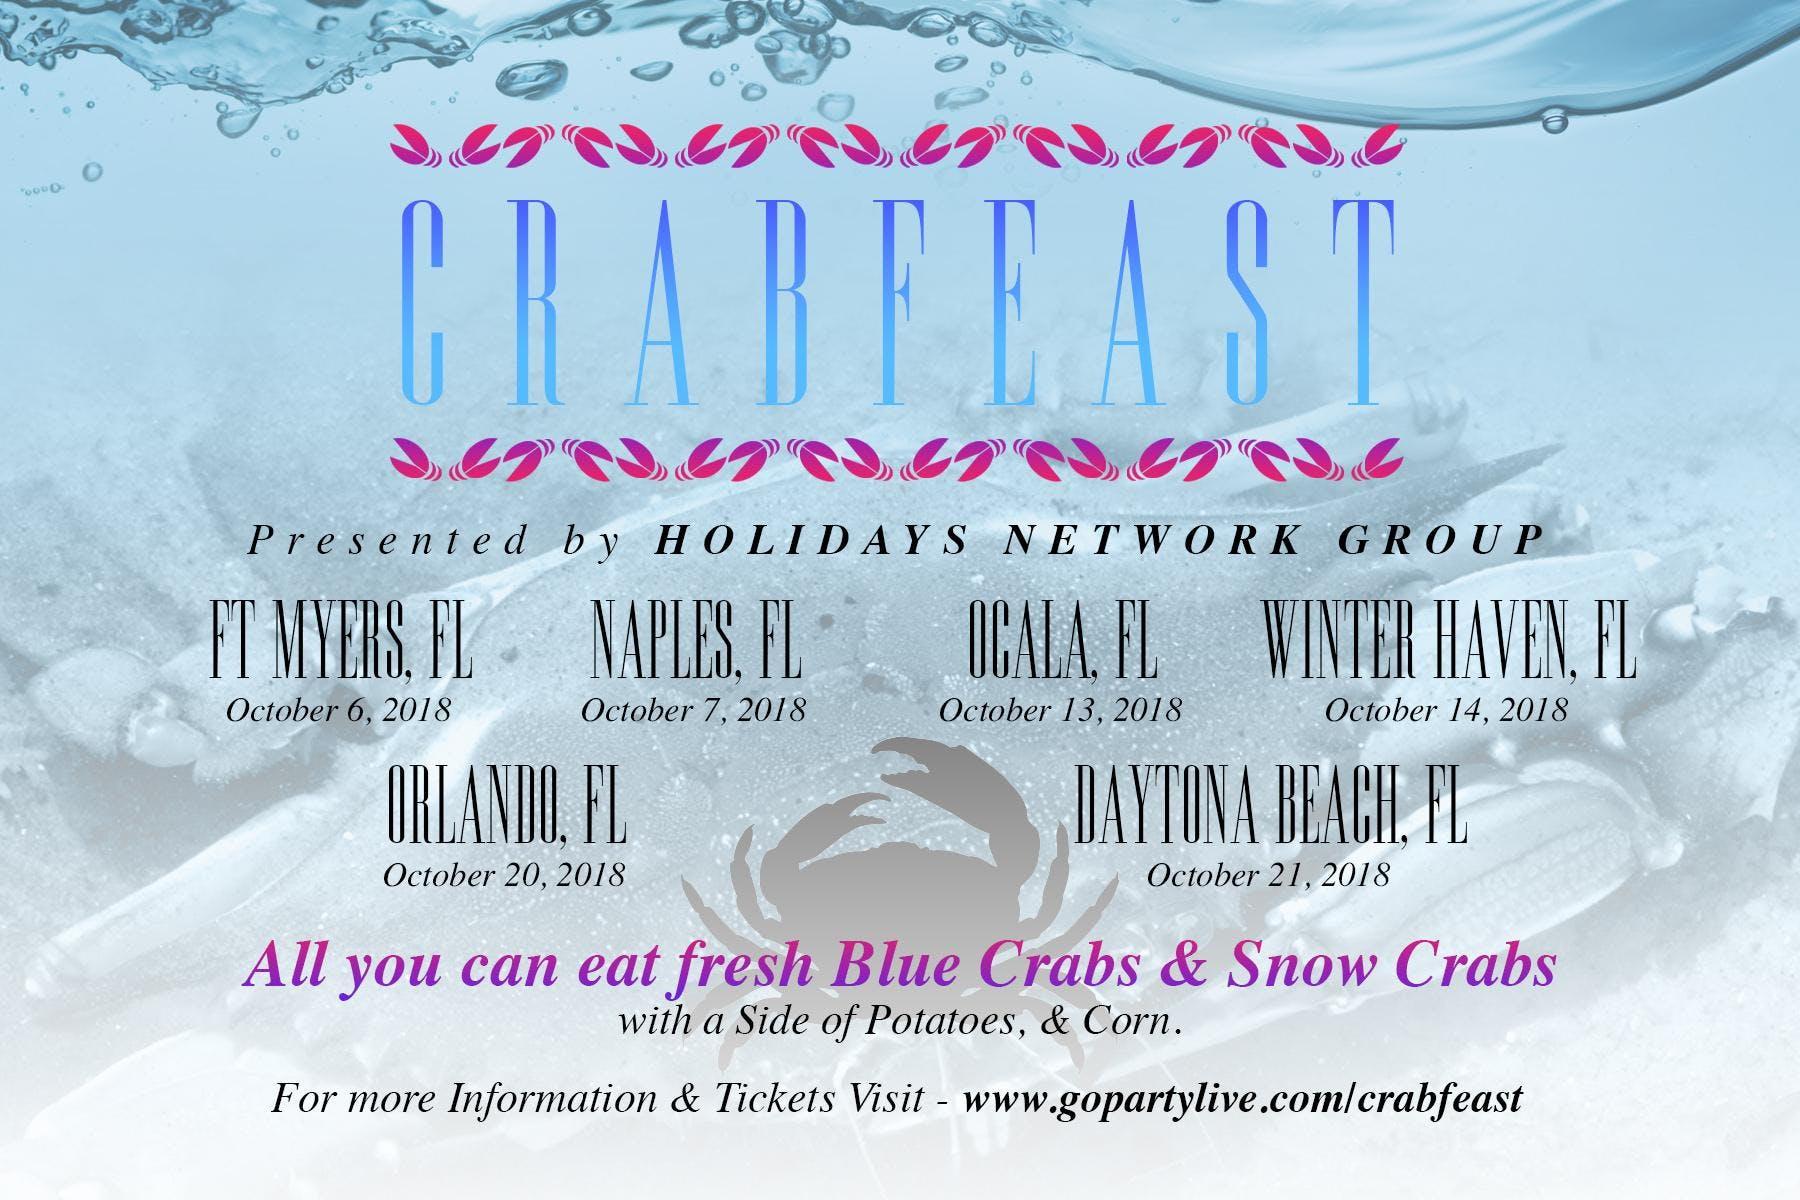 Crab Feast Tour Daytona Beach